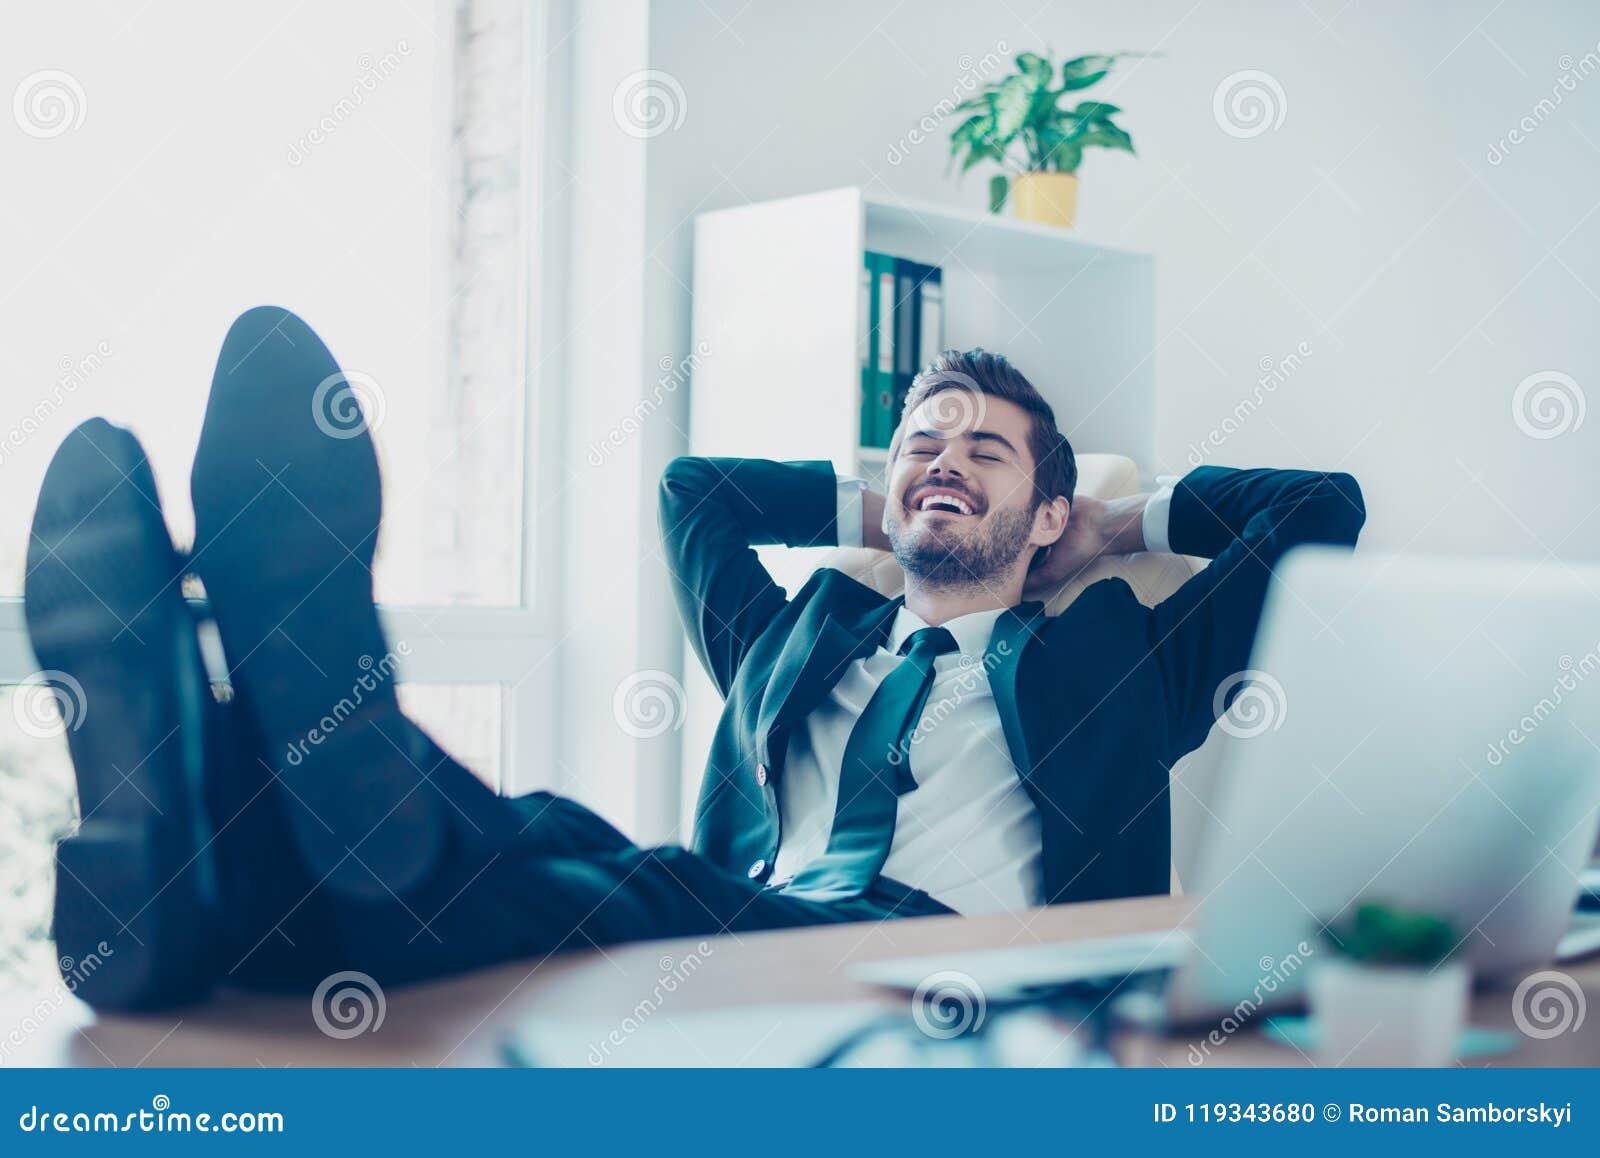 Gelukkige vrolijke glimlachende jonge ondernemer die op stoelwi liggen